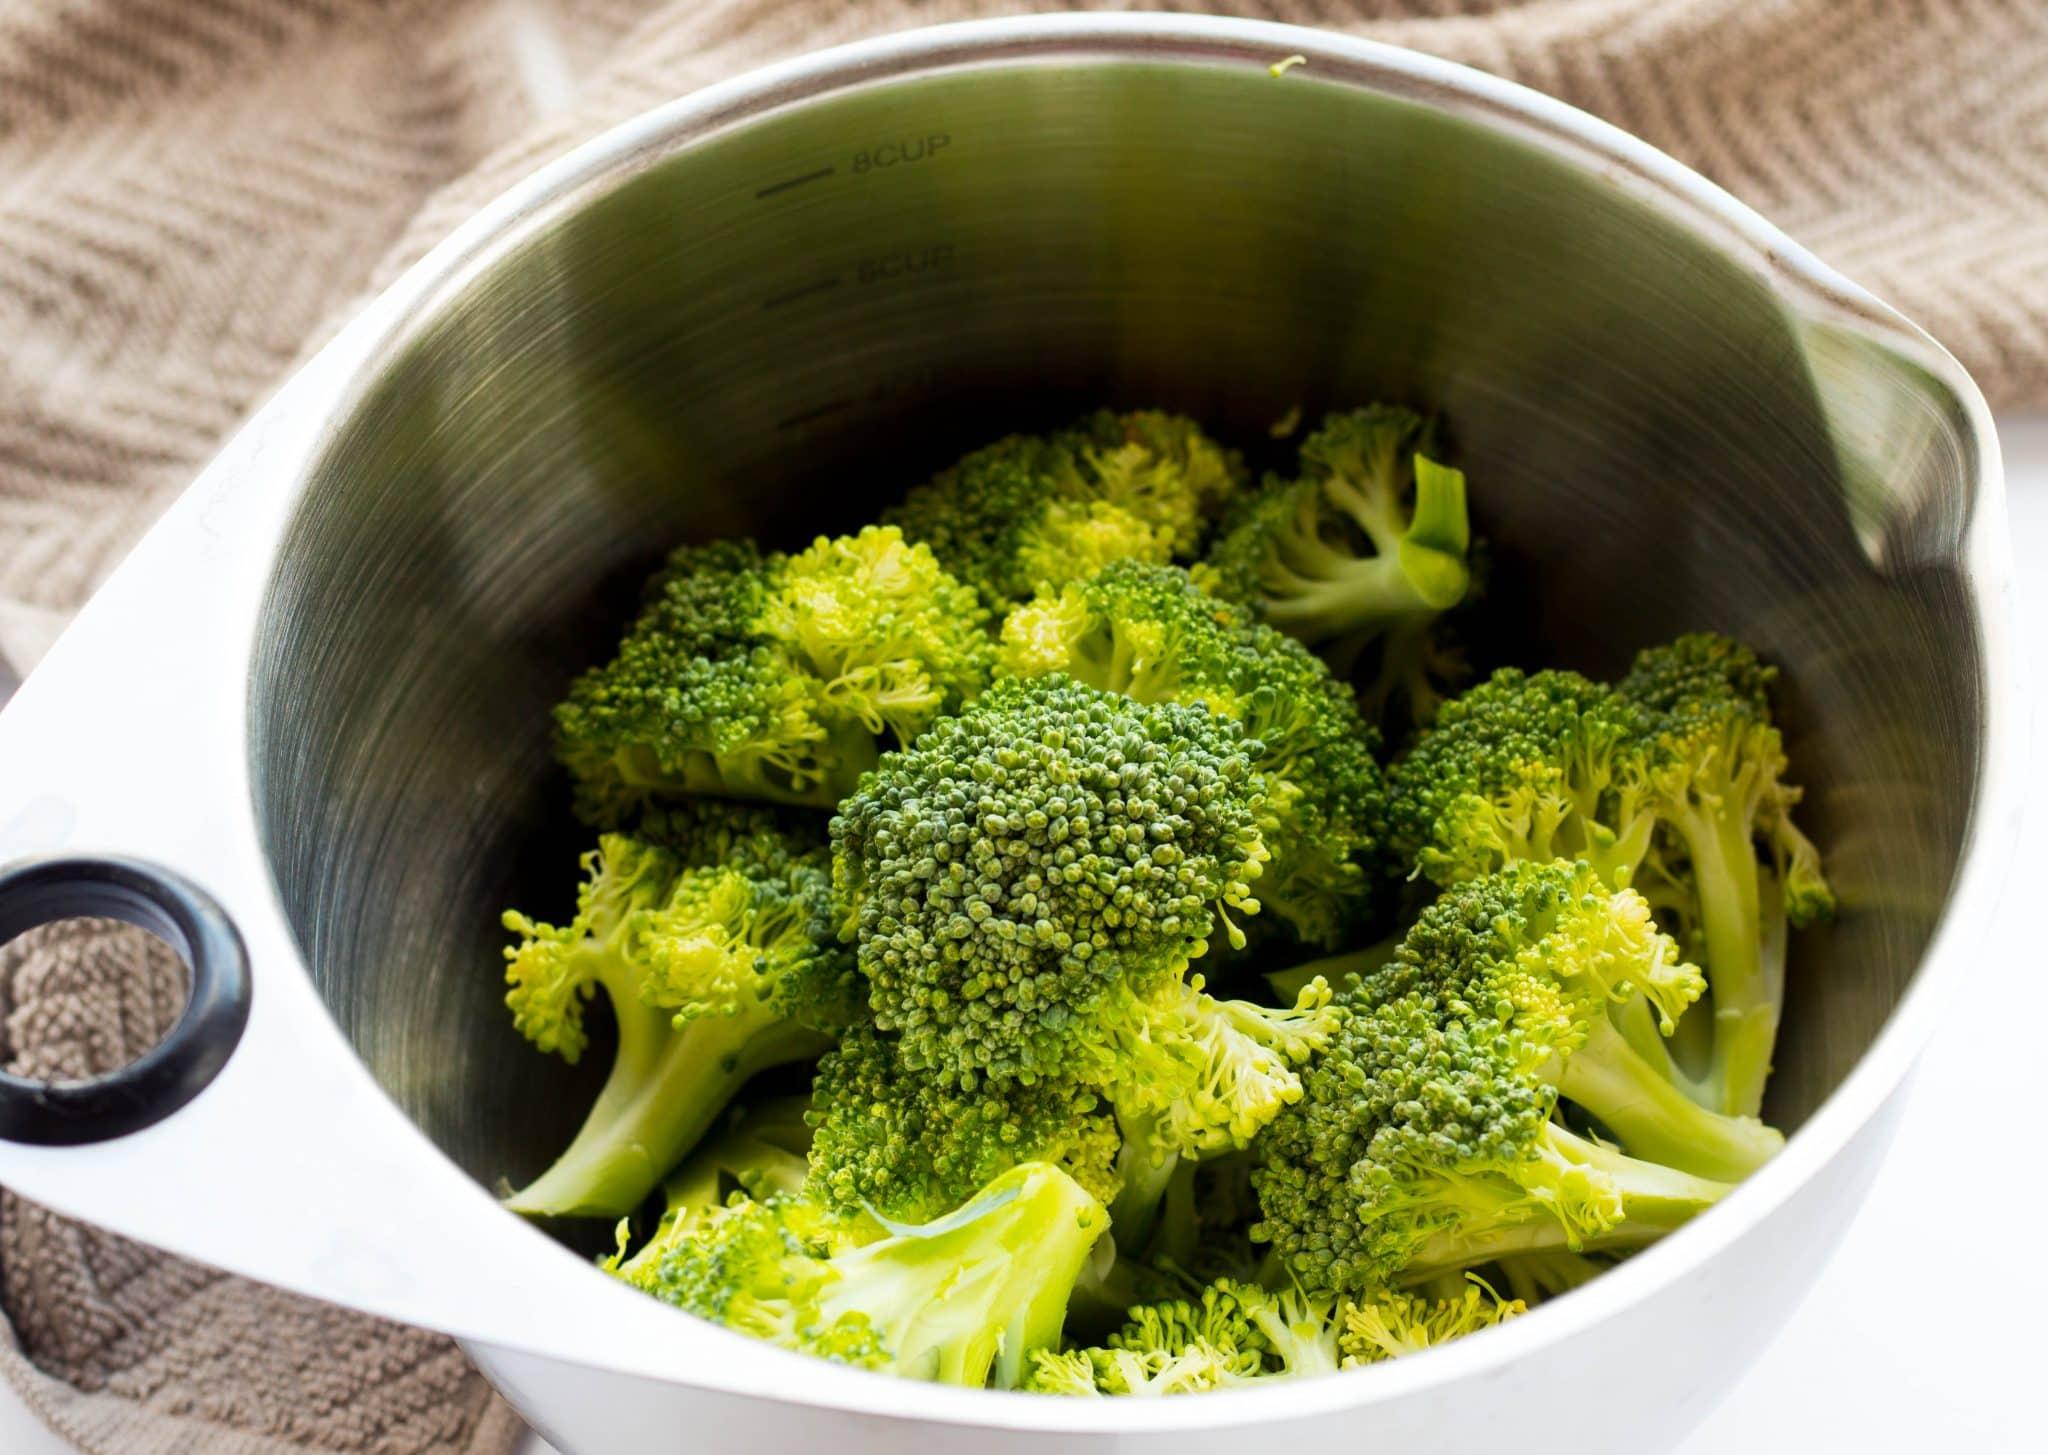 Fresh broccoli florets 4 cups = 247 calories